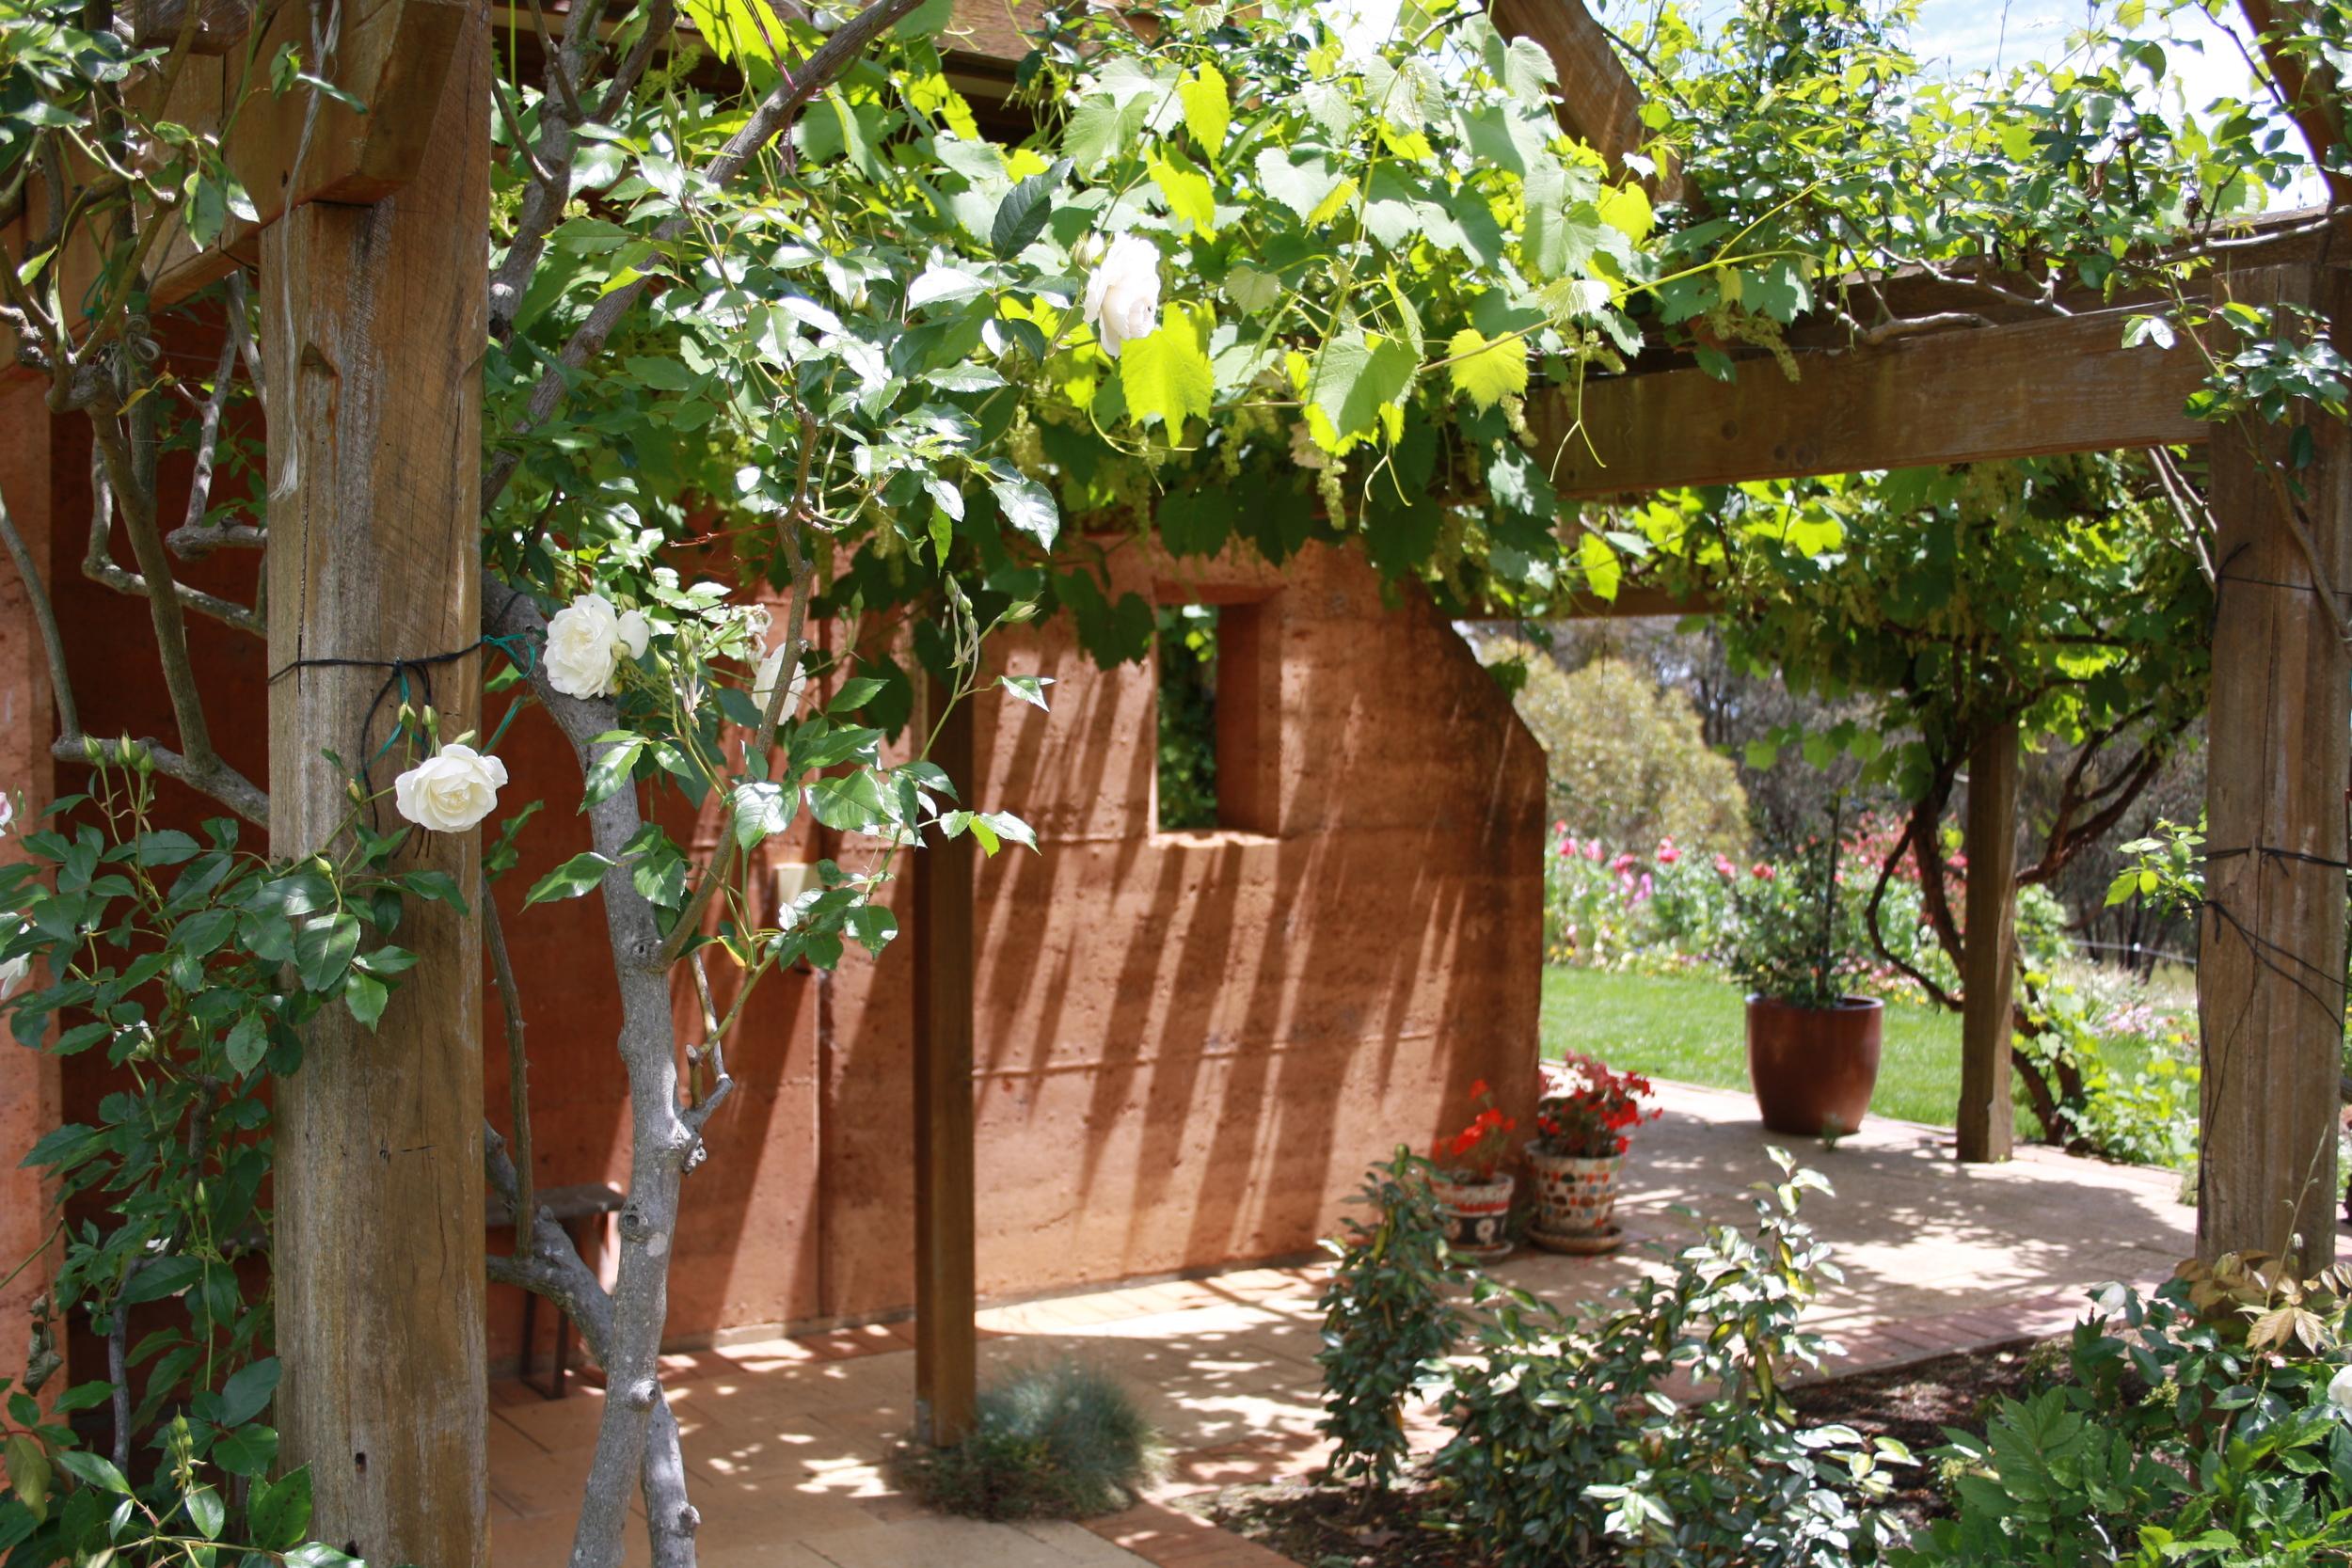 Andrew_Economos_Custom_Builder_Bowral_NSW_Australia_Earth_Home_6.JPG